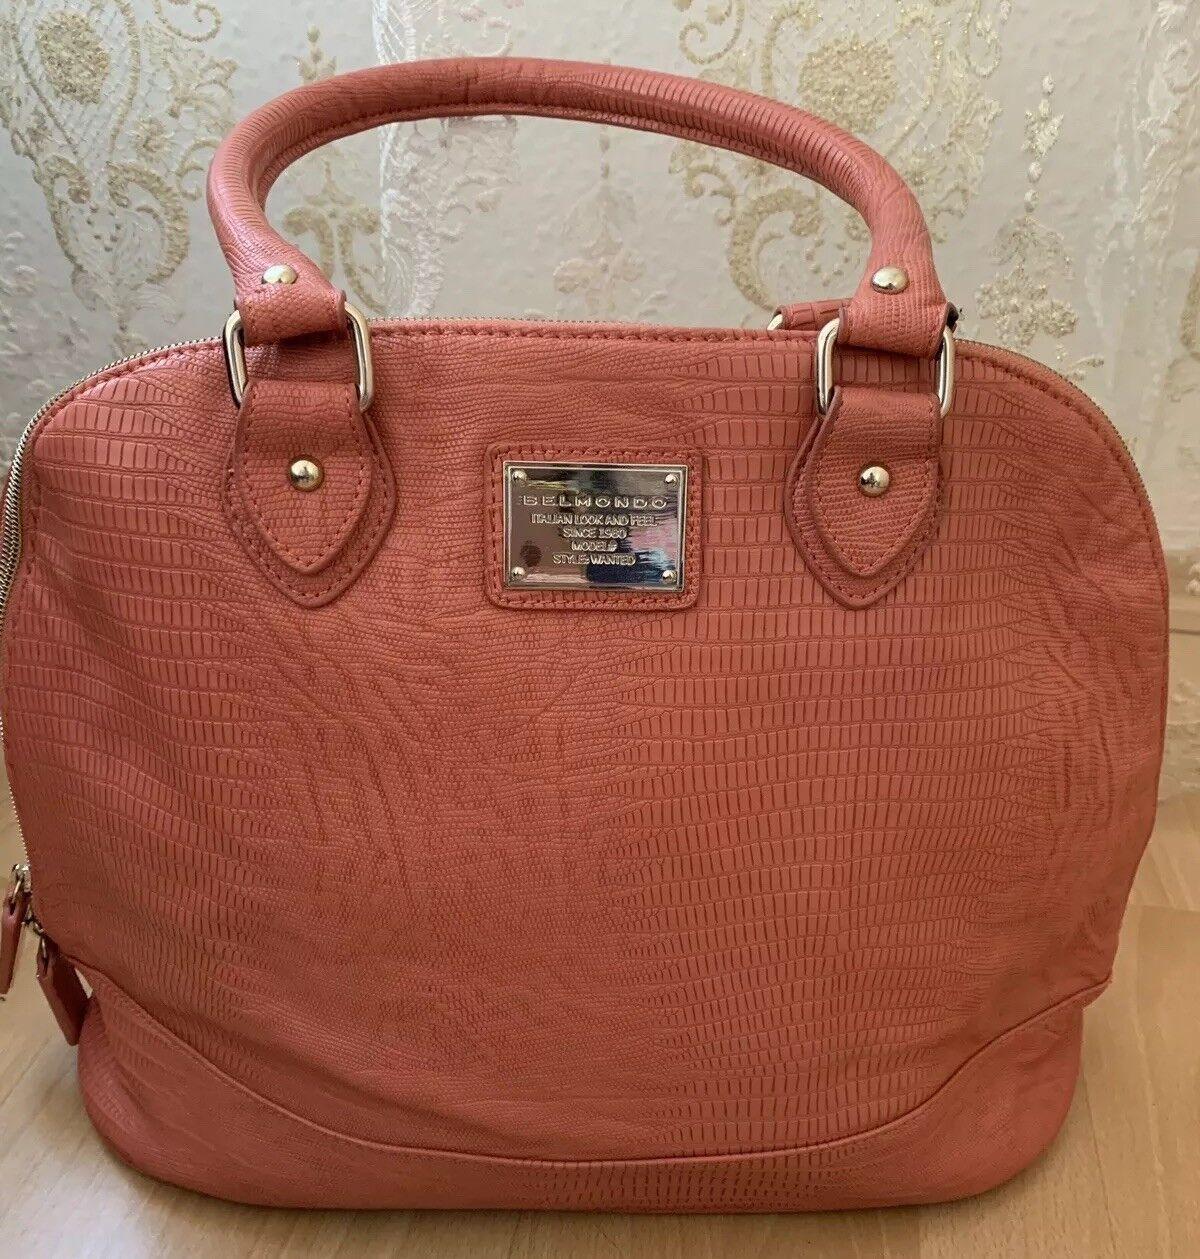 36c07c31c8d82 ... Tasche Umgängetasche Shopper Bag Belmondo Belmondo Belmondo ad80d3 ...